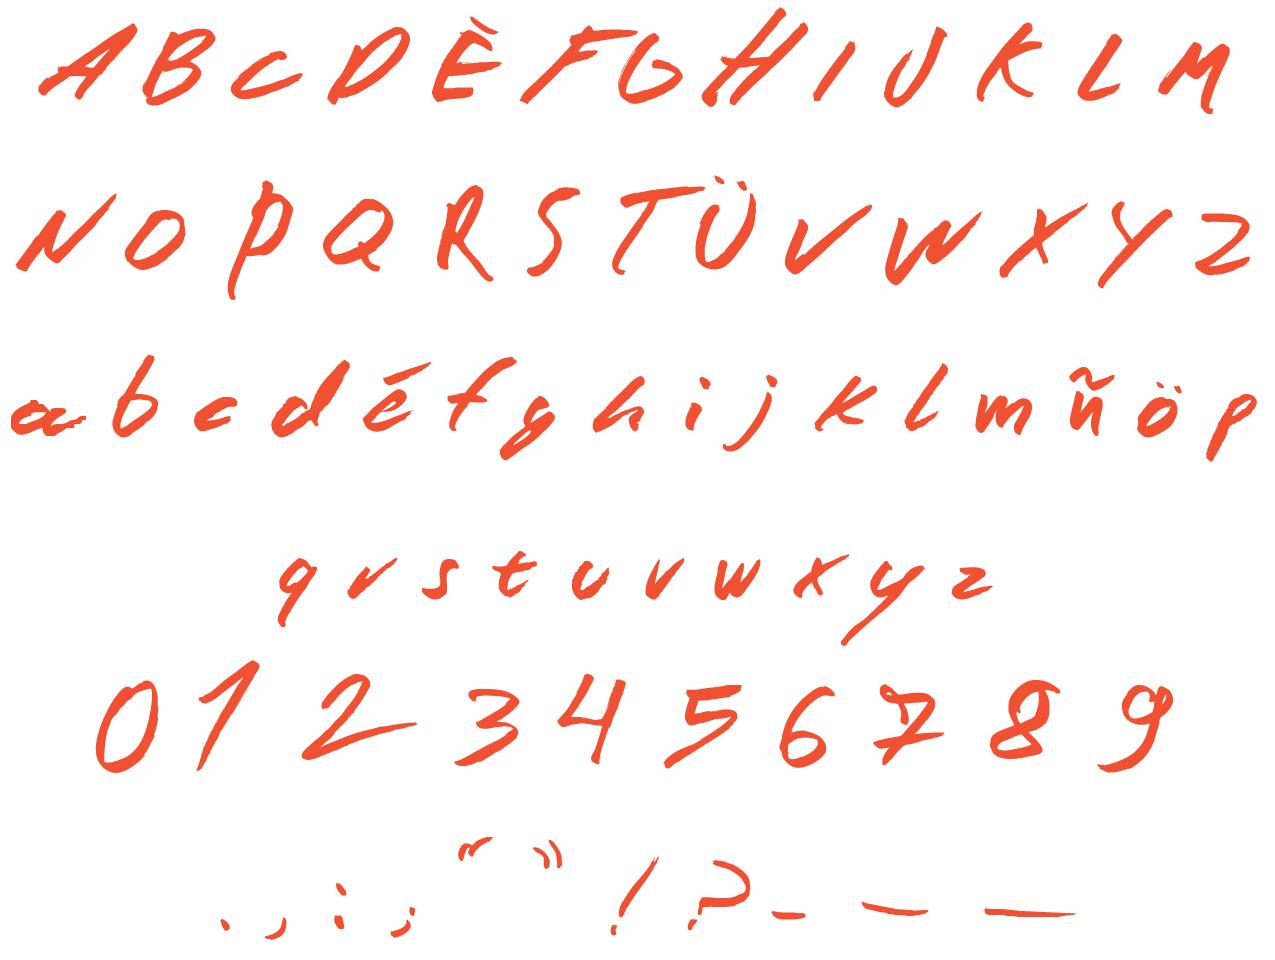 Wild Script « Mário Vinícius – Graphic & Type Designer concernant Police Script Ecole